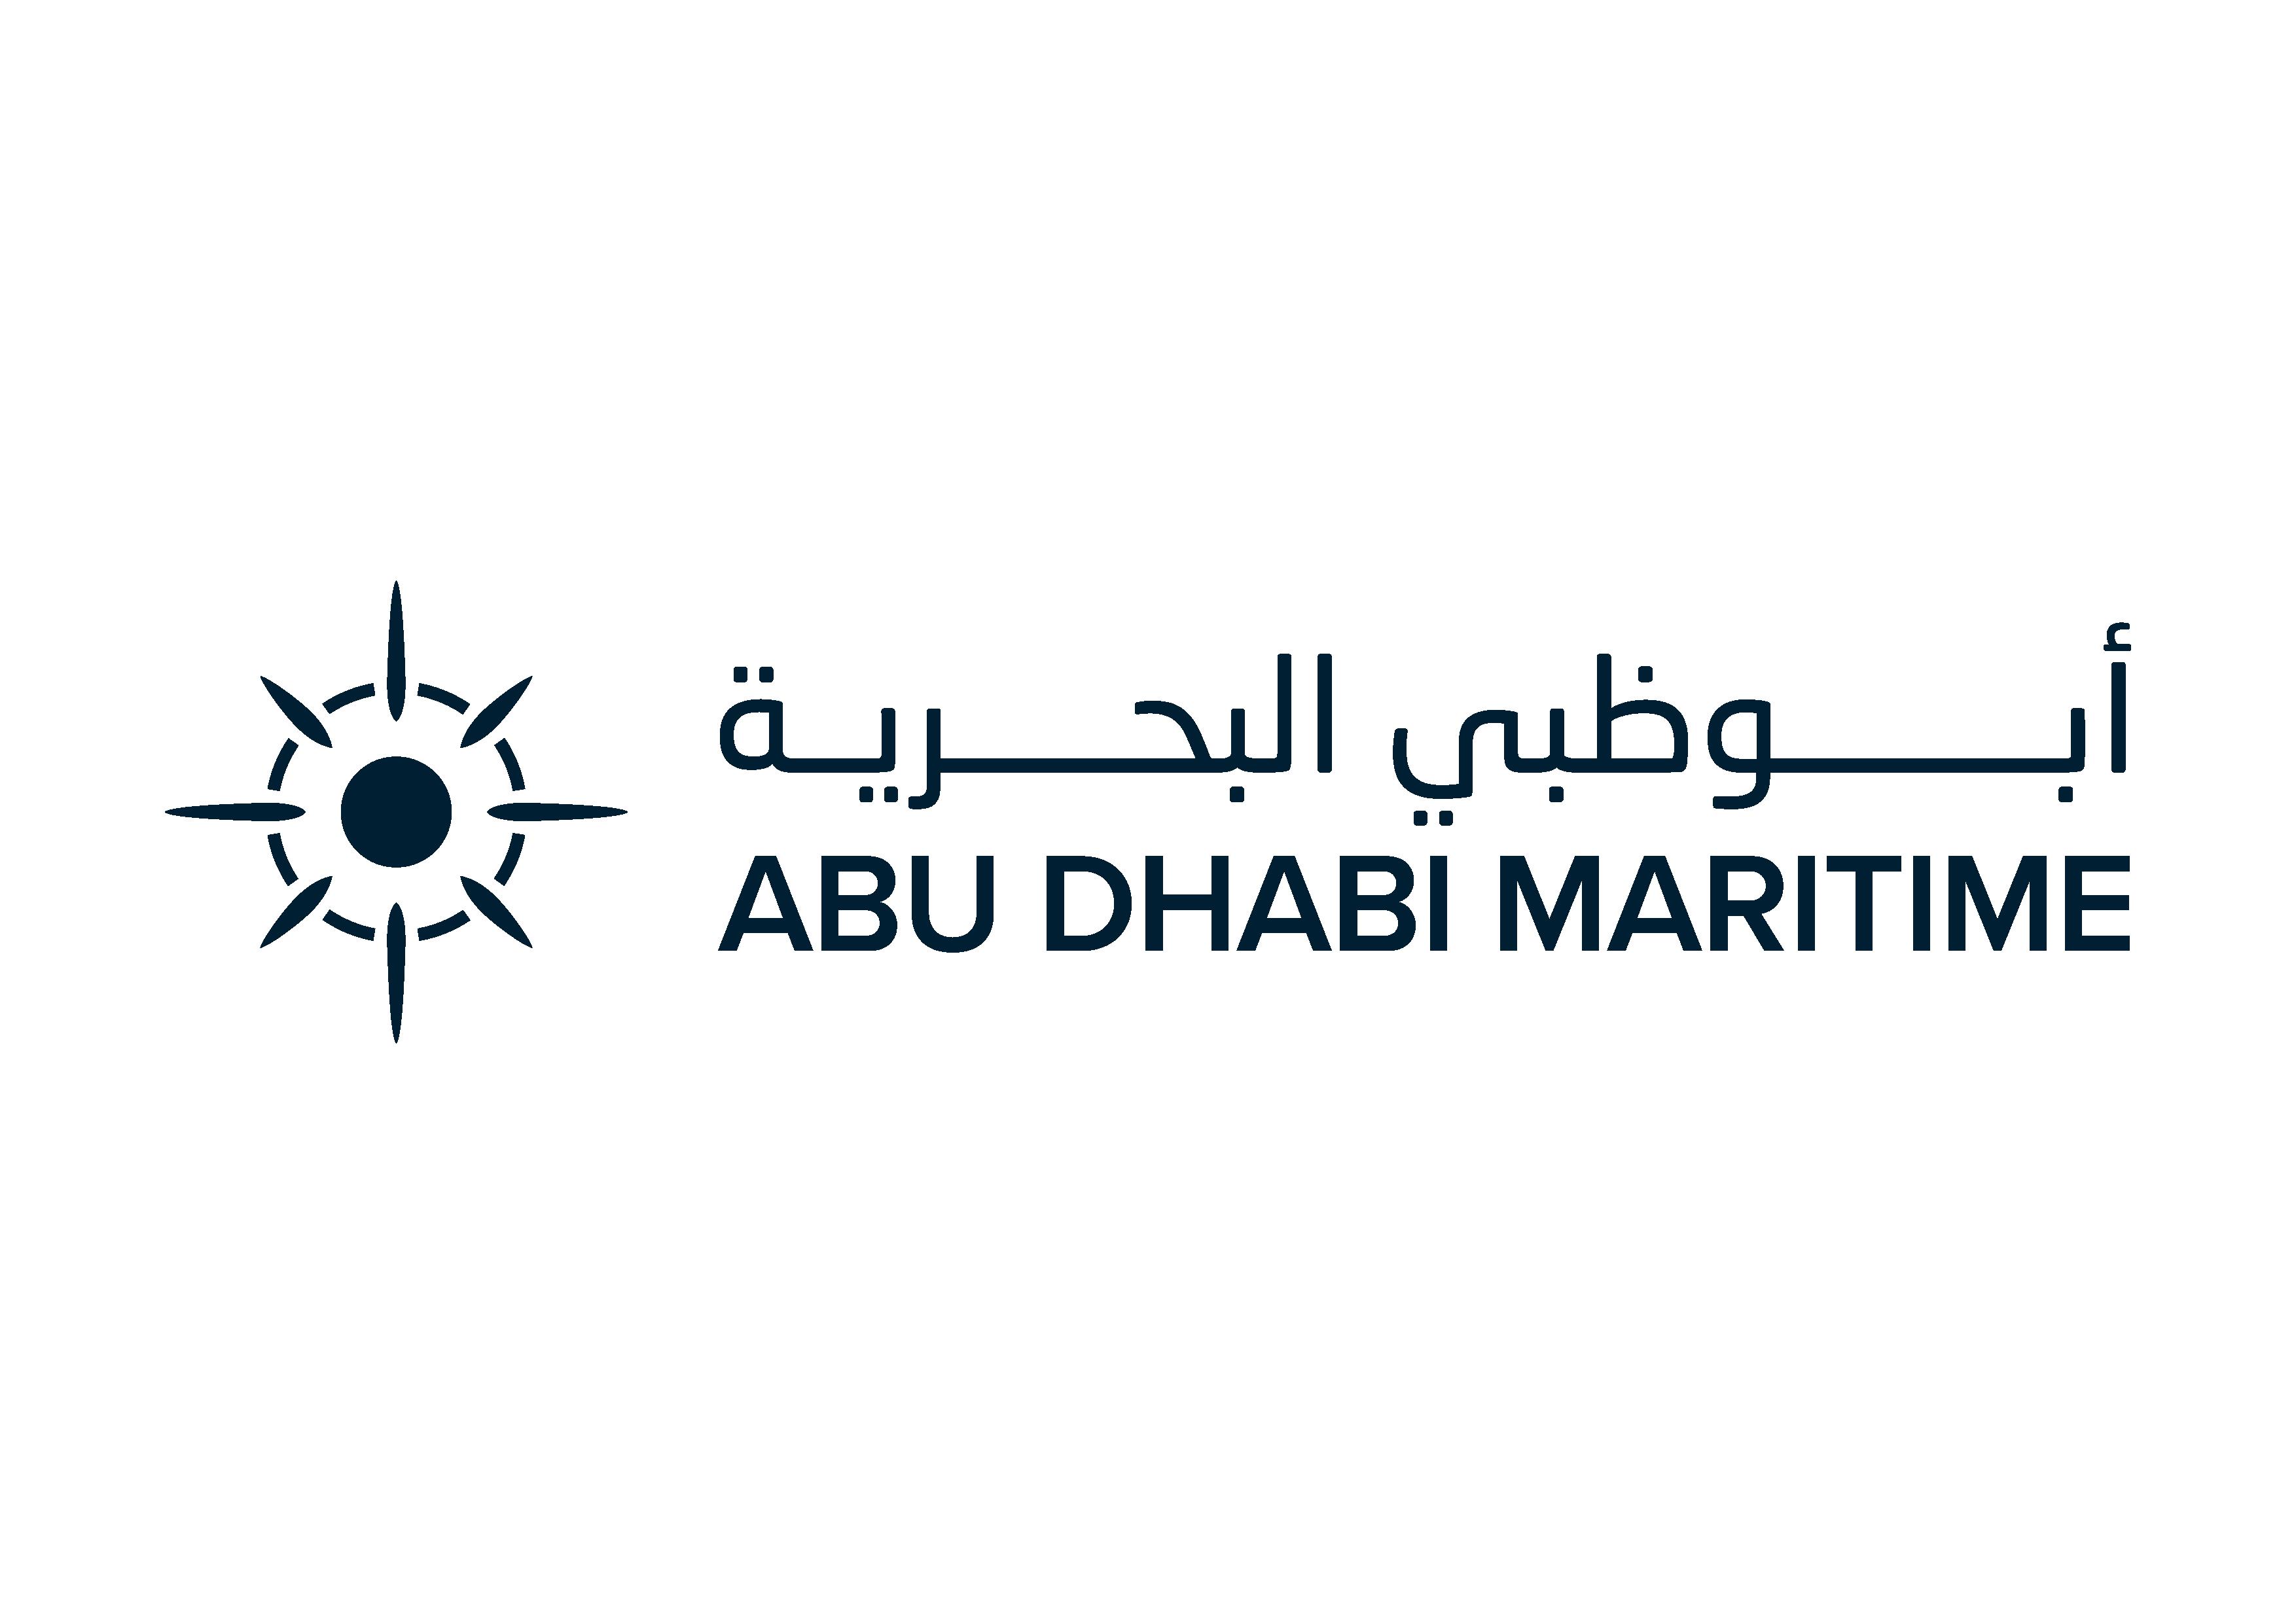 Abu Dhabi Maritime